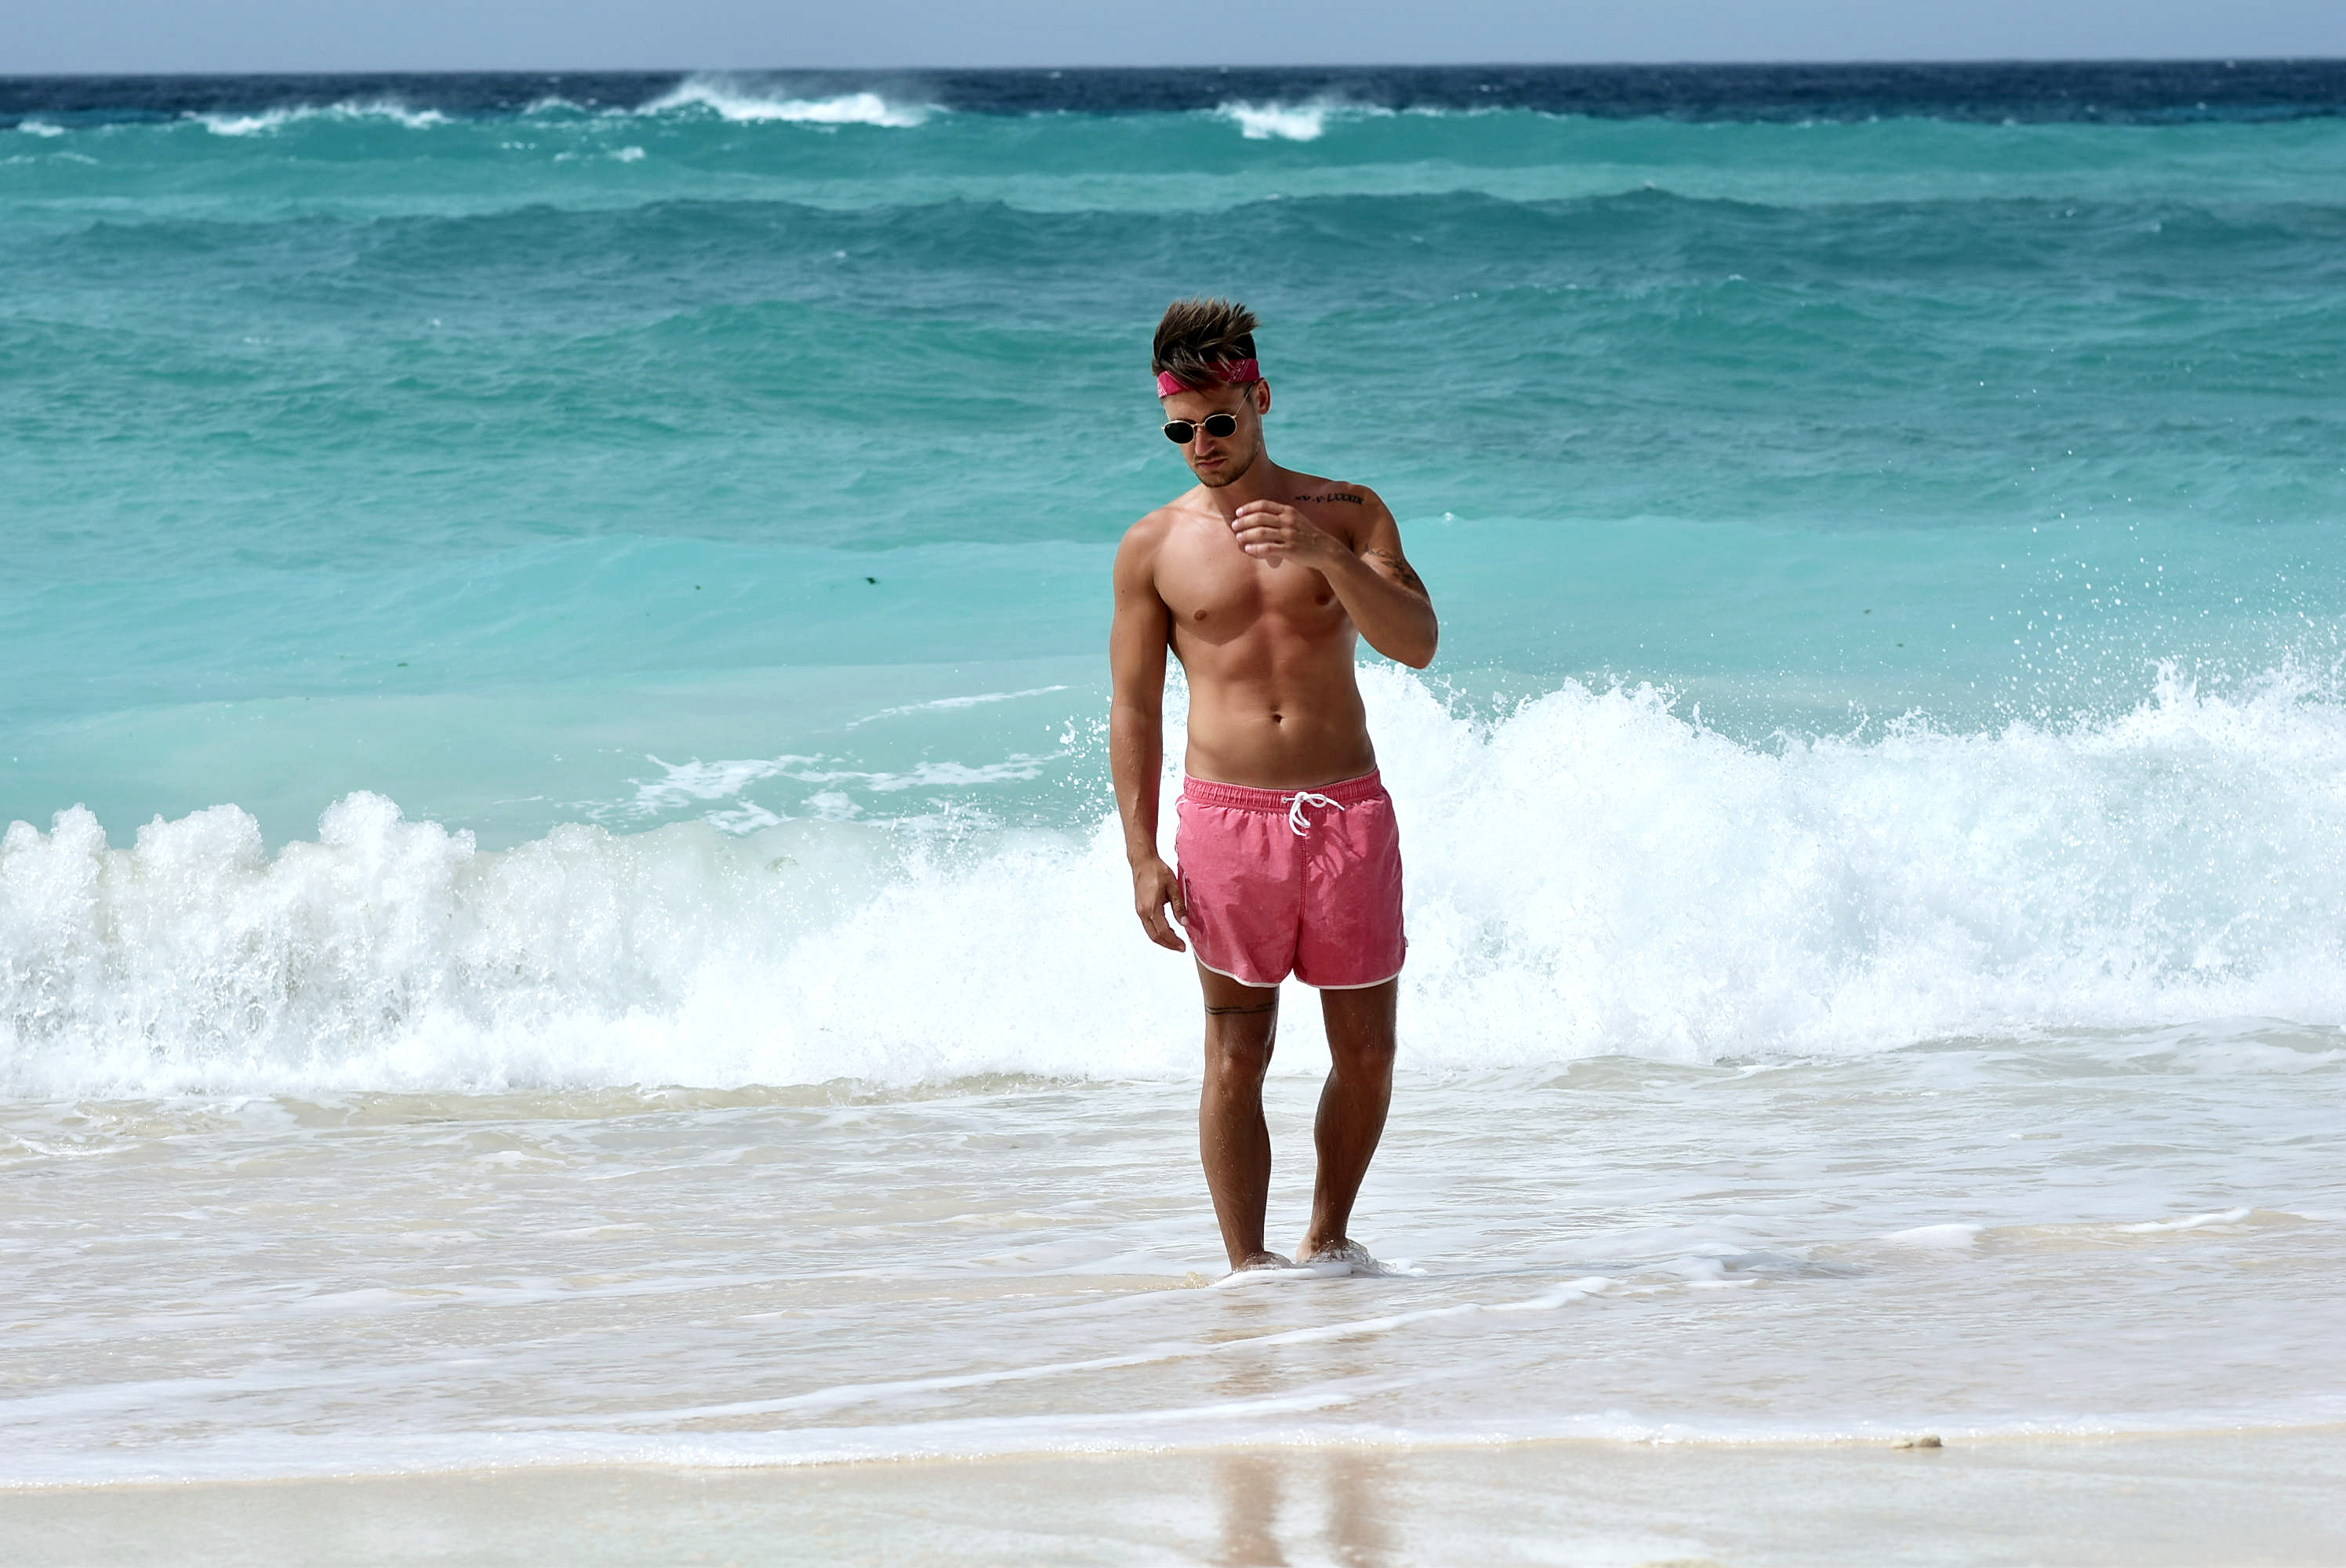 Tommeezjerry-Männerblog-Berlinblog-Fashionblog-Styleblog-Travelblog-Travel-Reiseblog-Reisen-Barbados-Karibik-Carribean-Summer-Sommer-Vacation-3